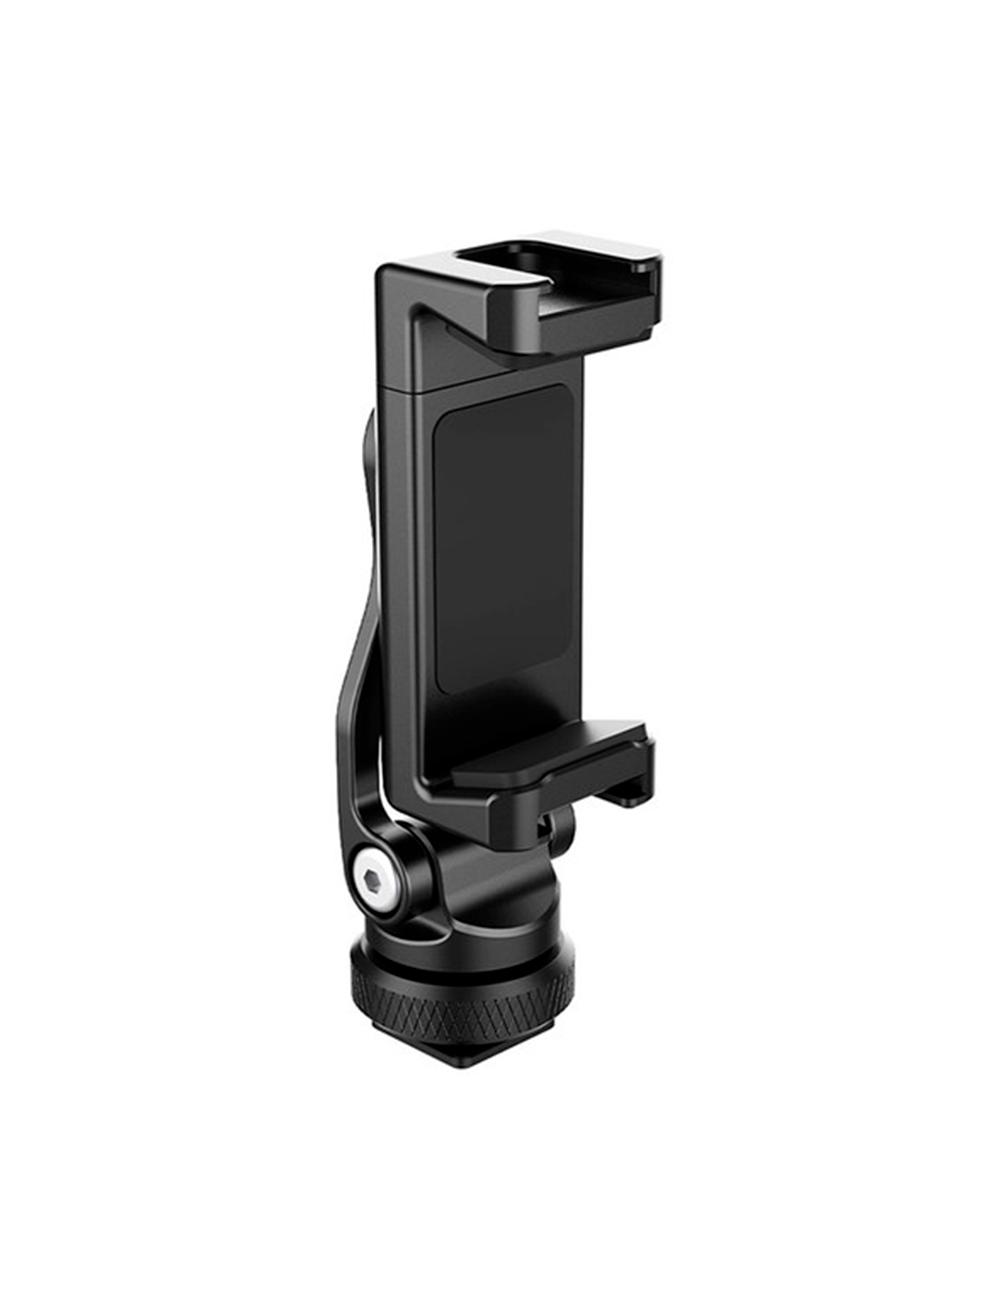 Micrófono BOYA BY-DM2 Mic DIgital Lavalier con conector tipo USB-C (Android)